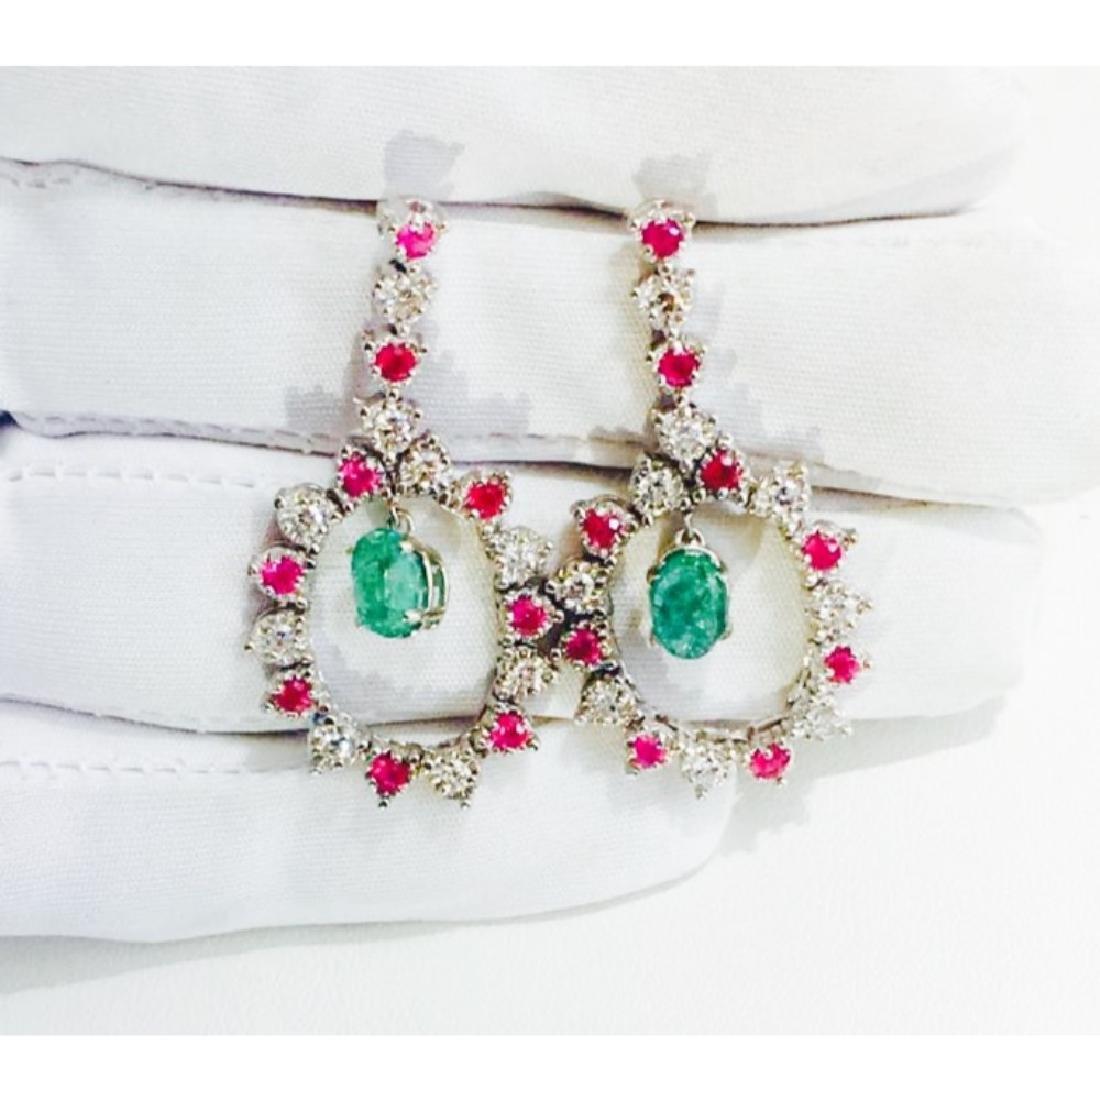 14K; Super Burma Ruby, Emerald & VS-F Diamond earrings - 3